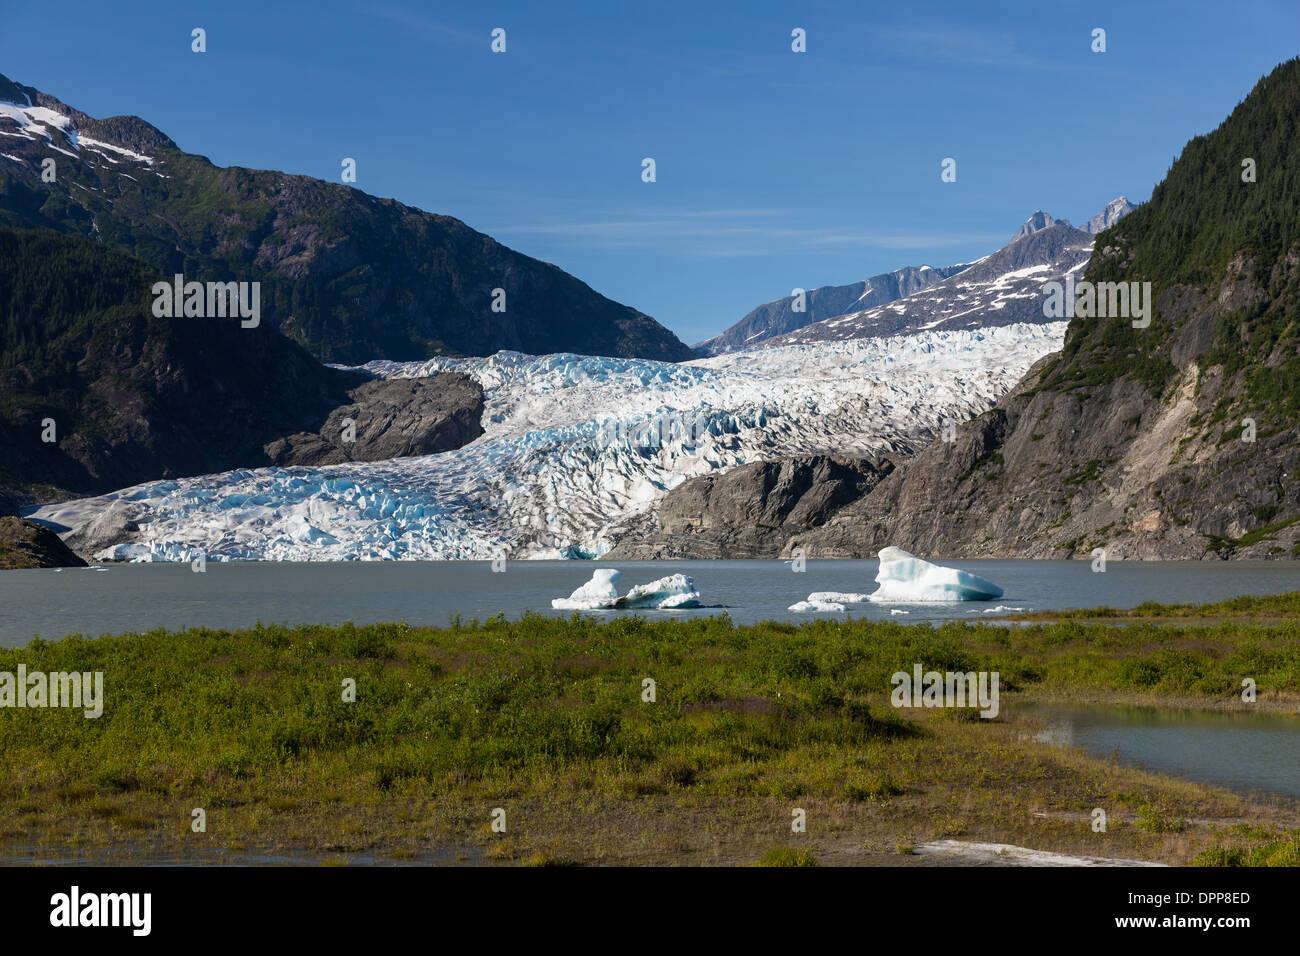 Mendenhall glacier, Juneau Alaska - Stock Image